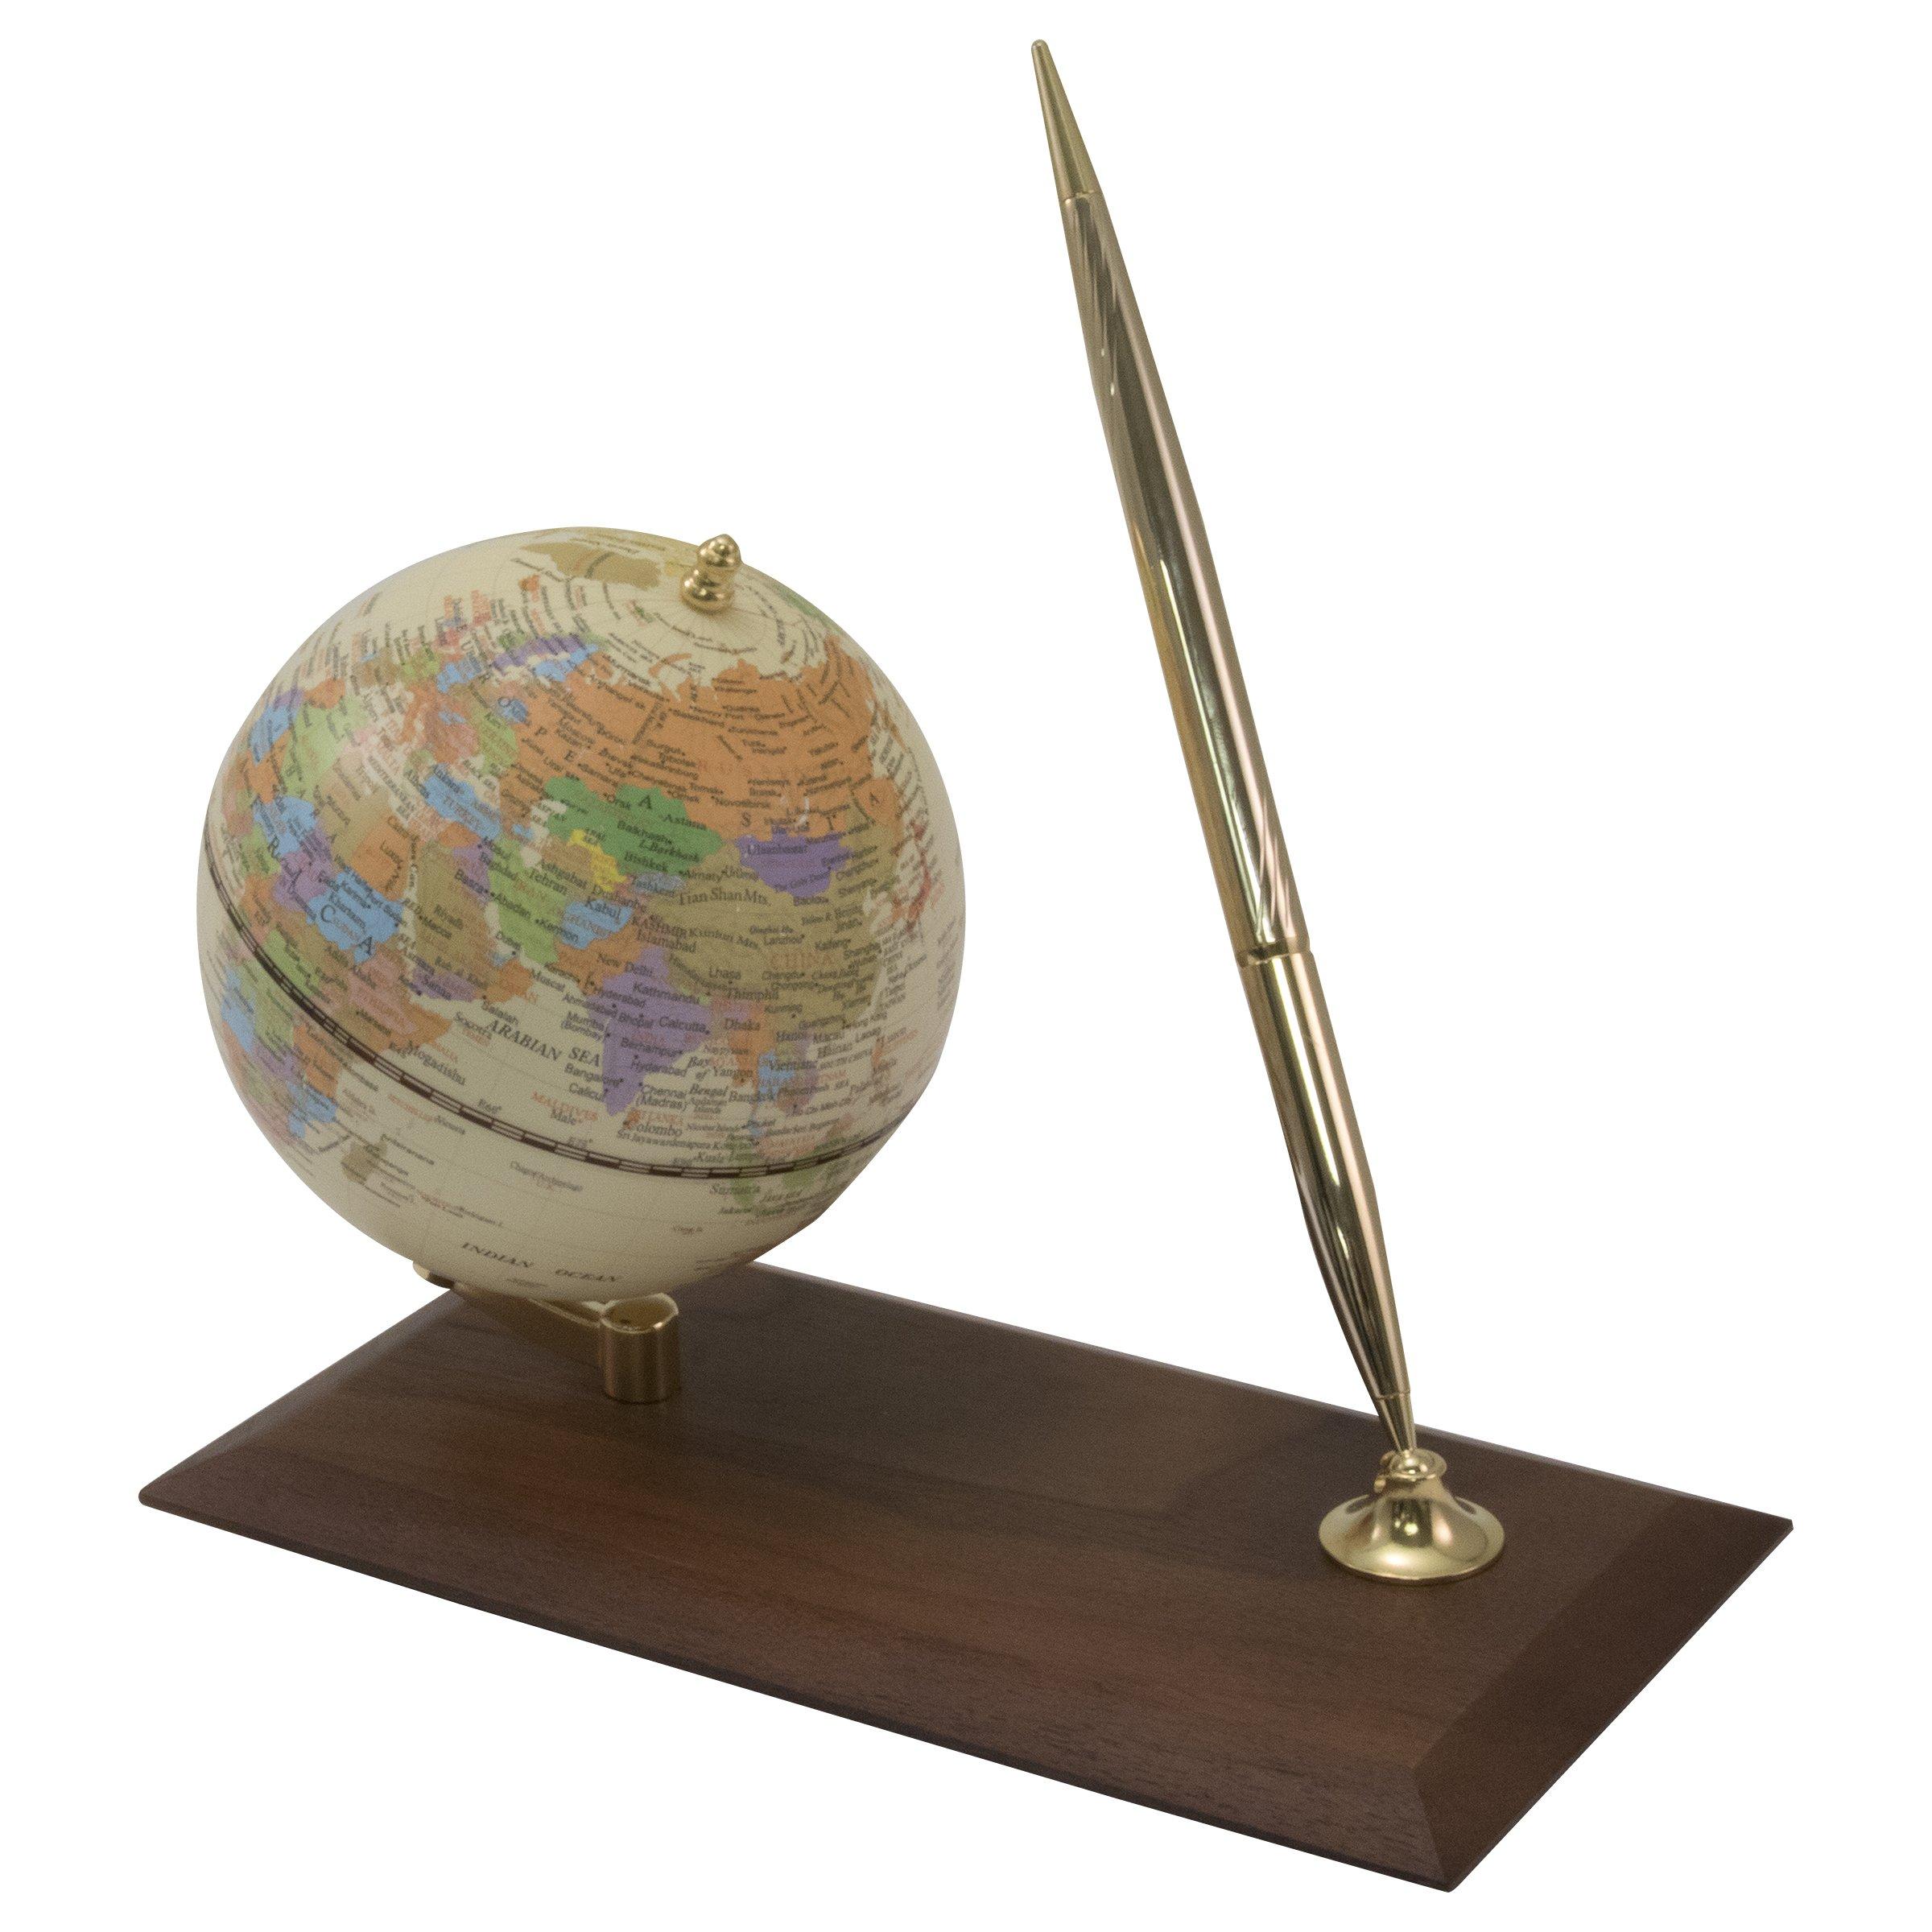 Advantus Desktop Globe with Pen Holder/Stand, Wood Base (30506) by Advantus